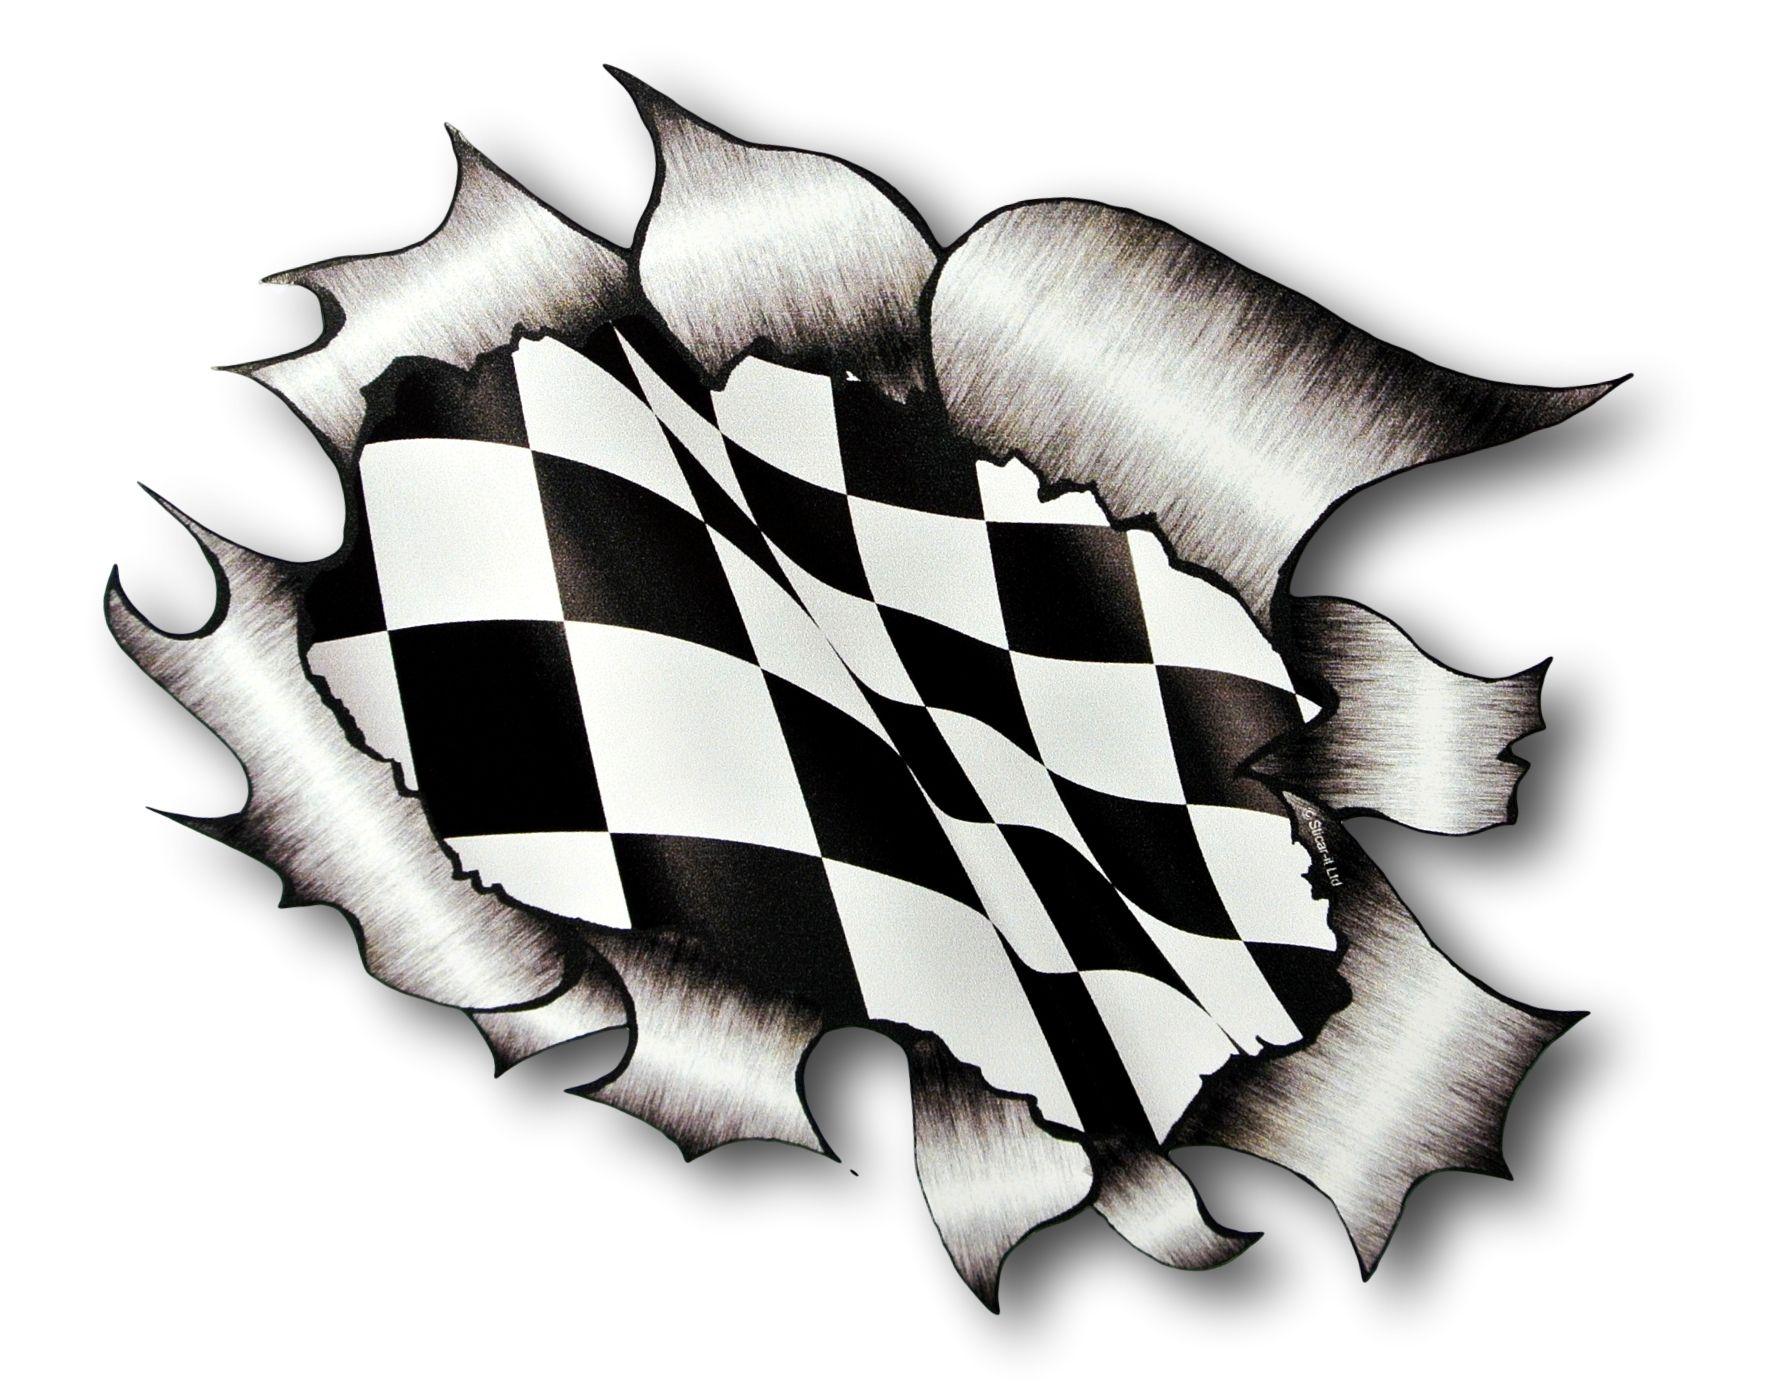 Ripped torn metal design with race style chequered flag motif external vinyl car sticker 105x130mm 2435 p jpeg